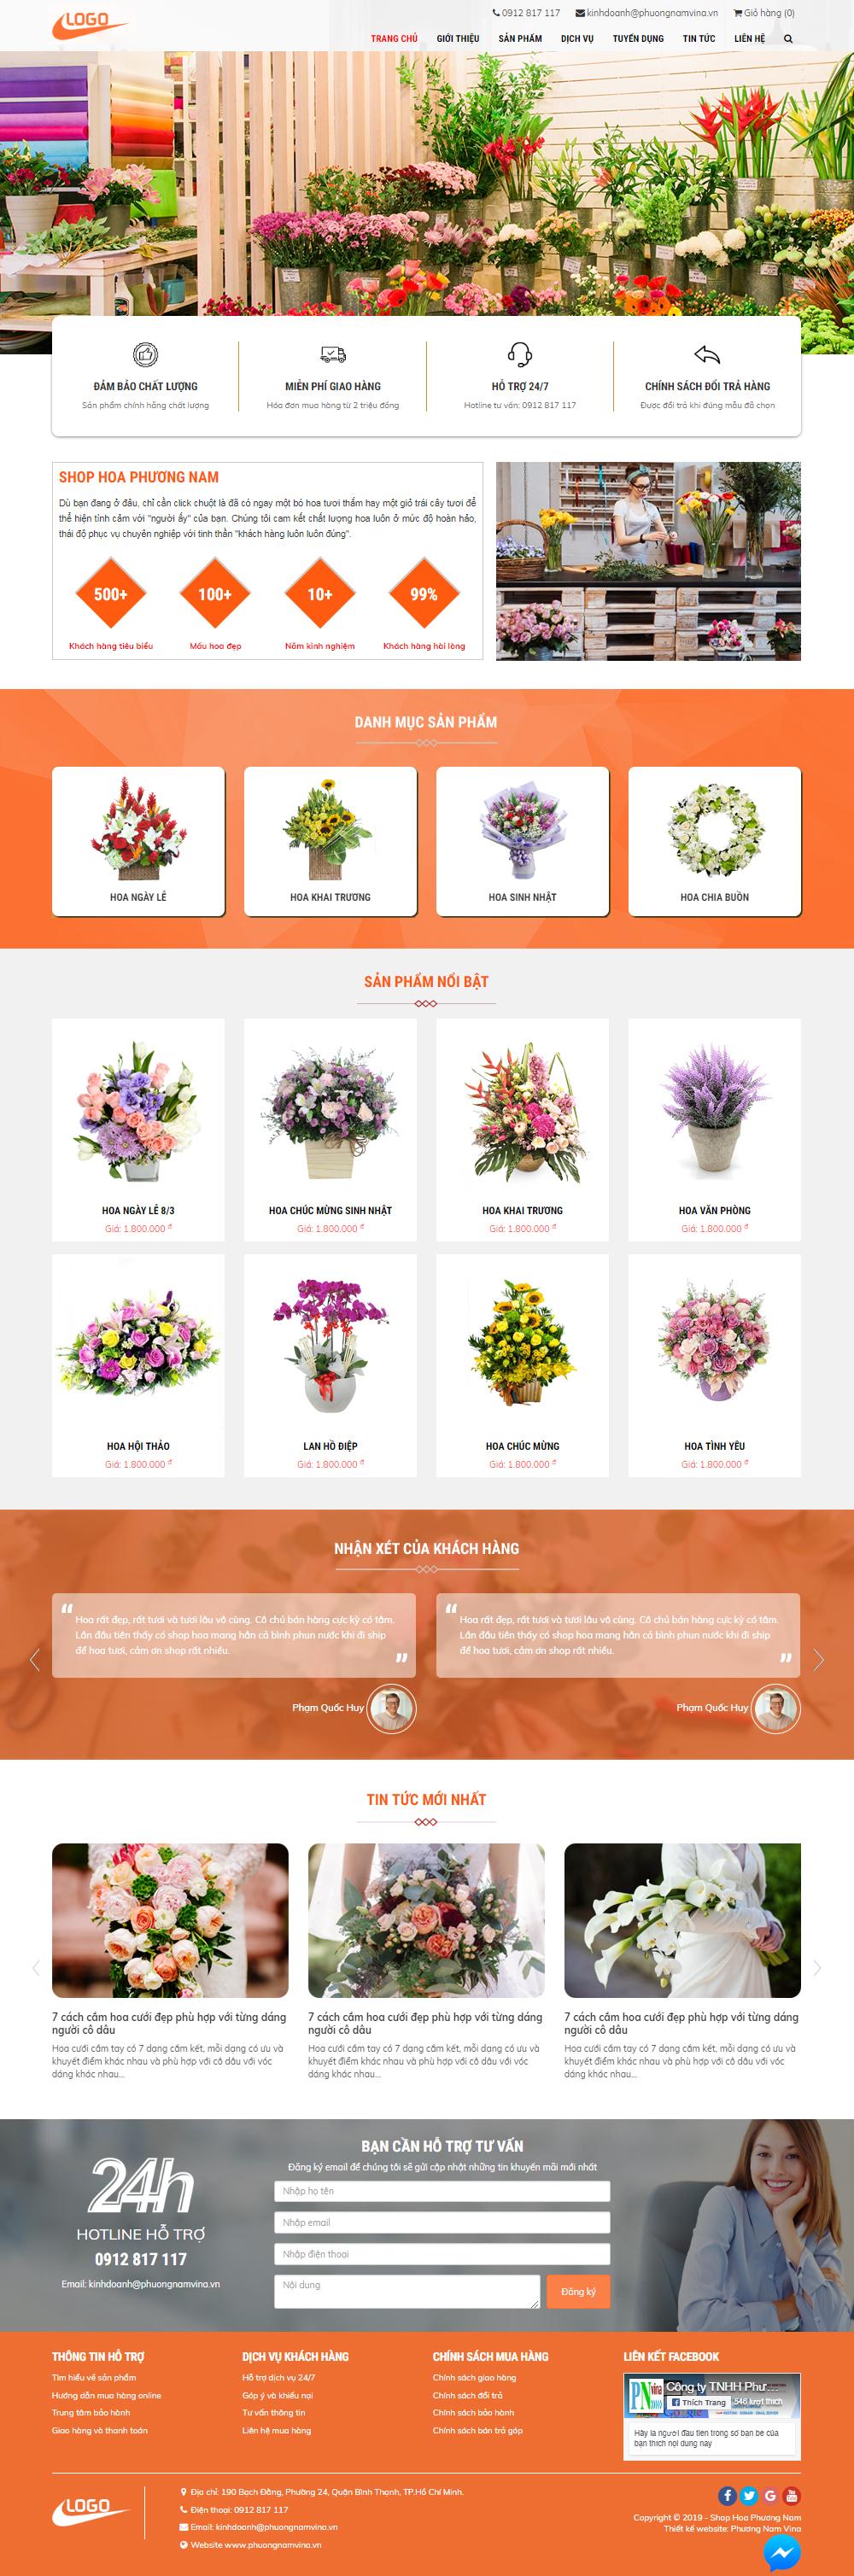 Mẫu website bán hoa